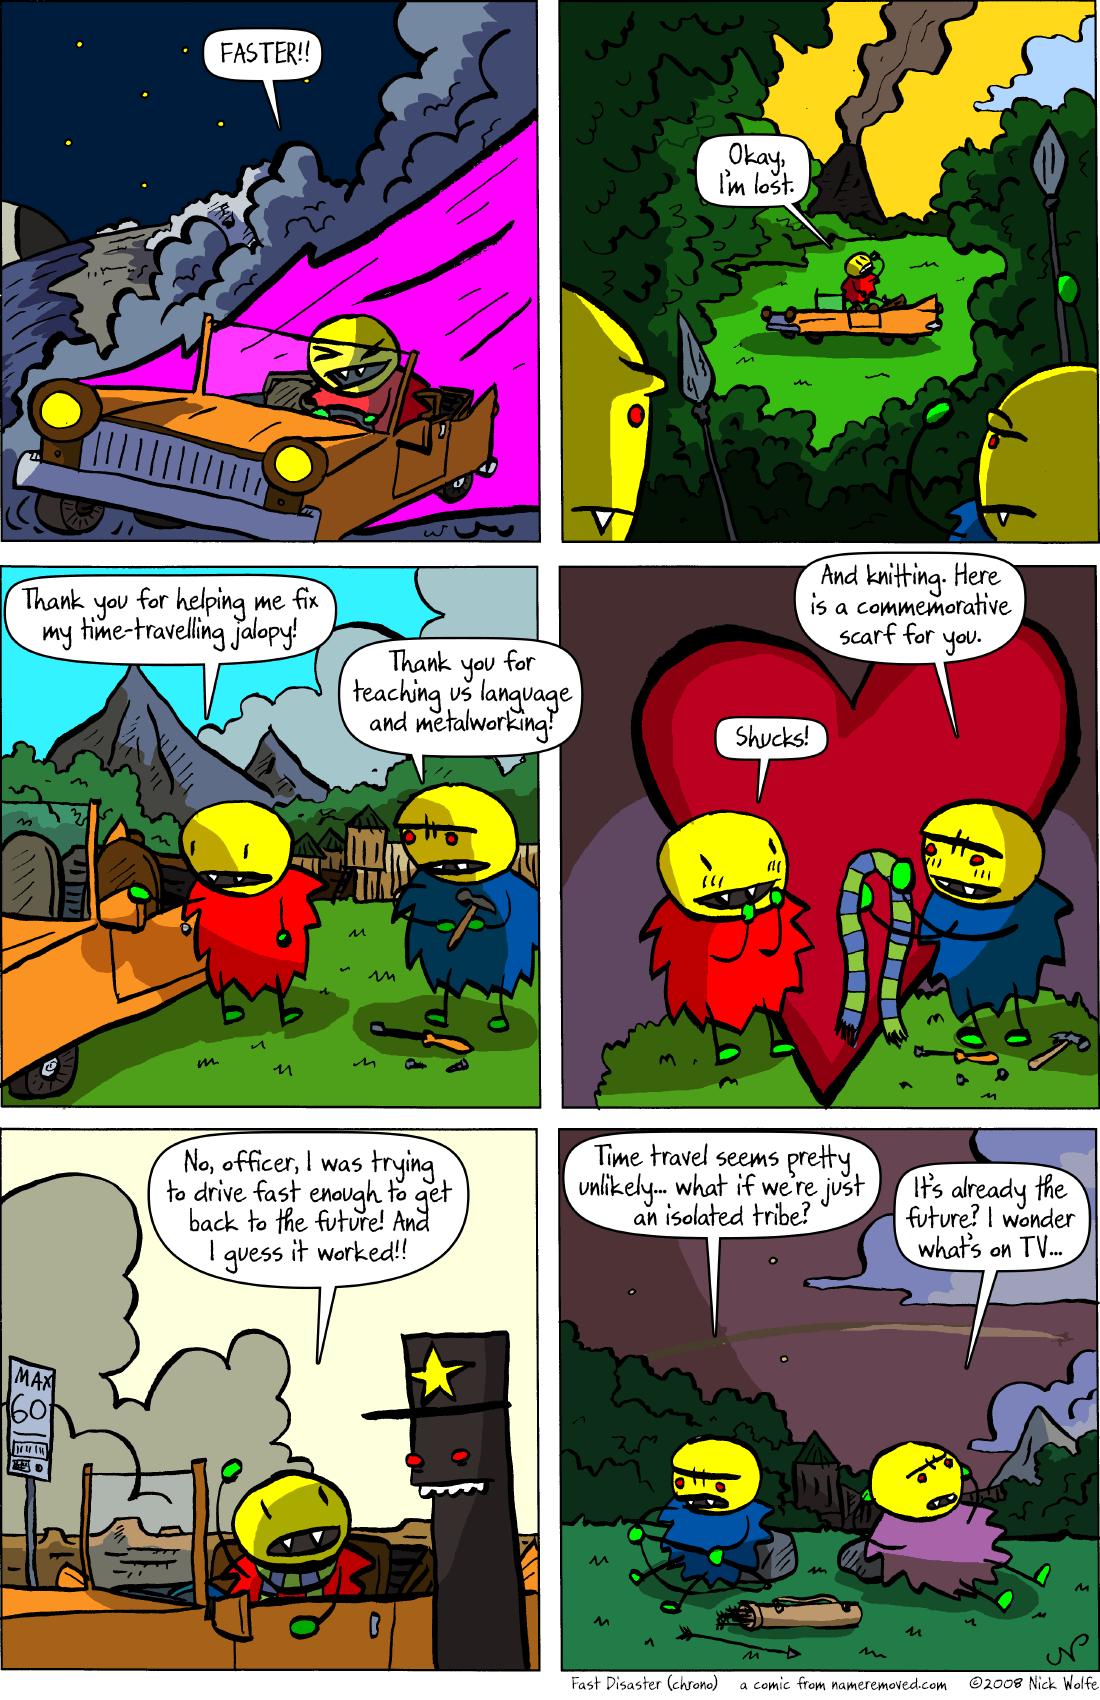 Fast Disaster (chrono)